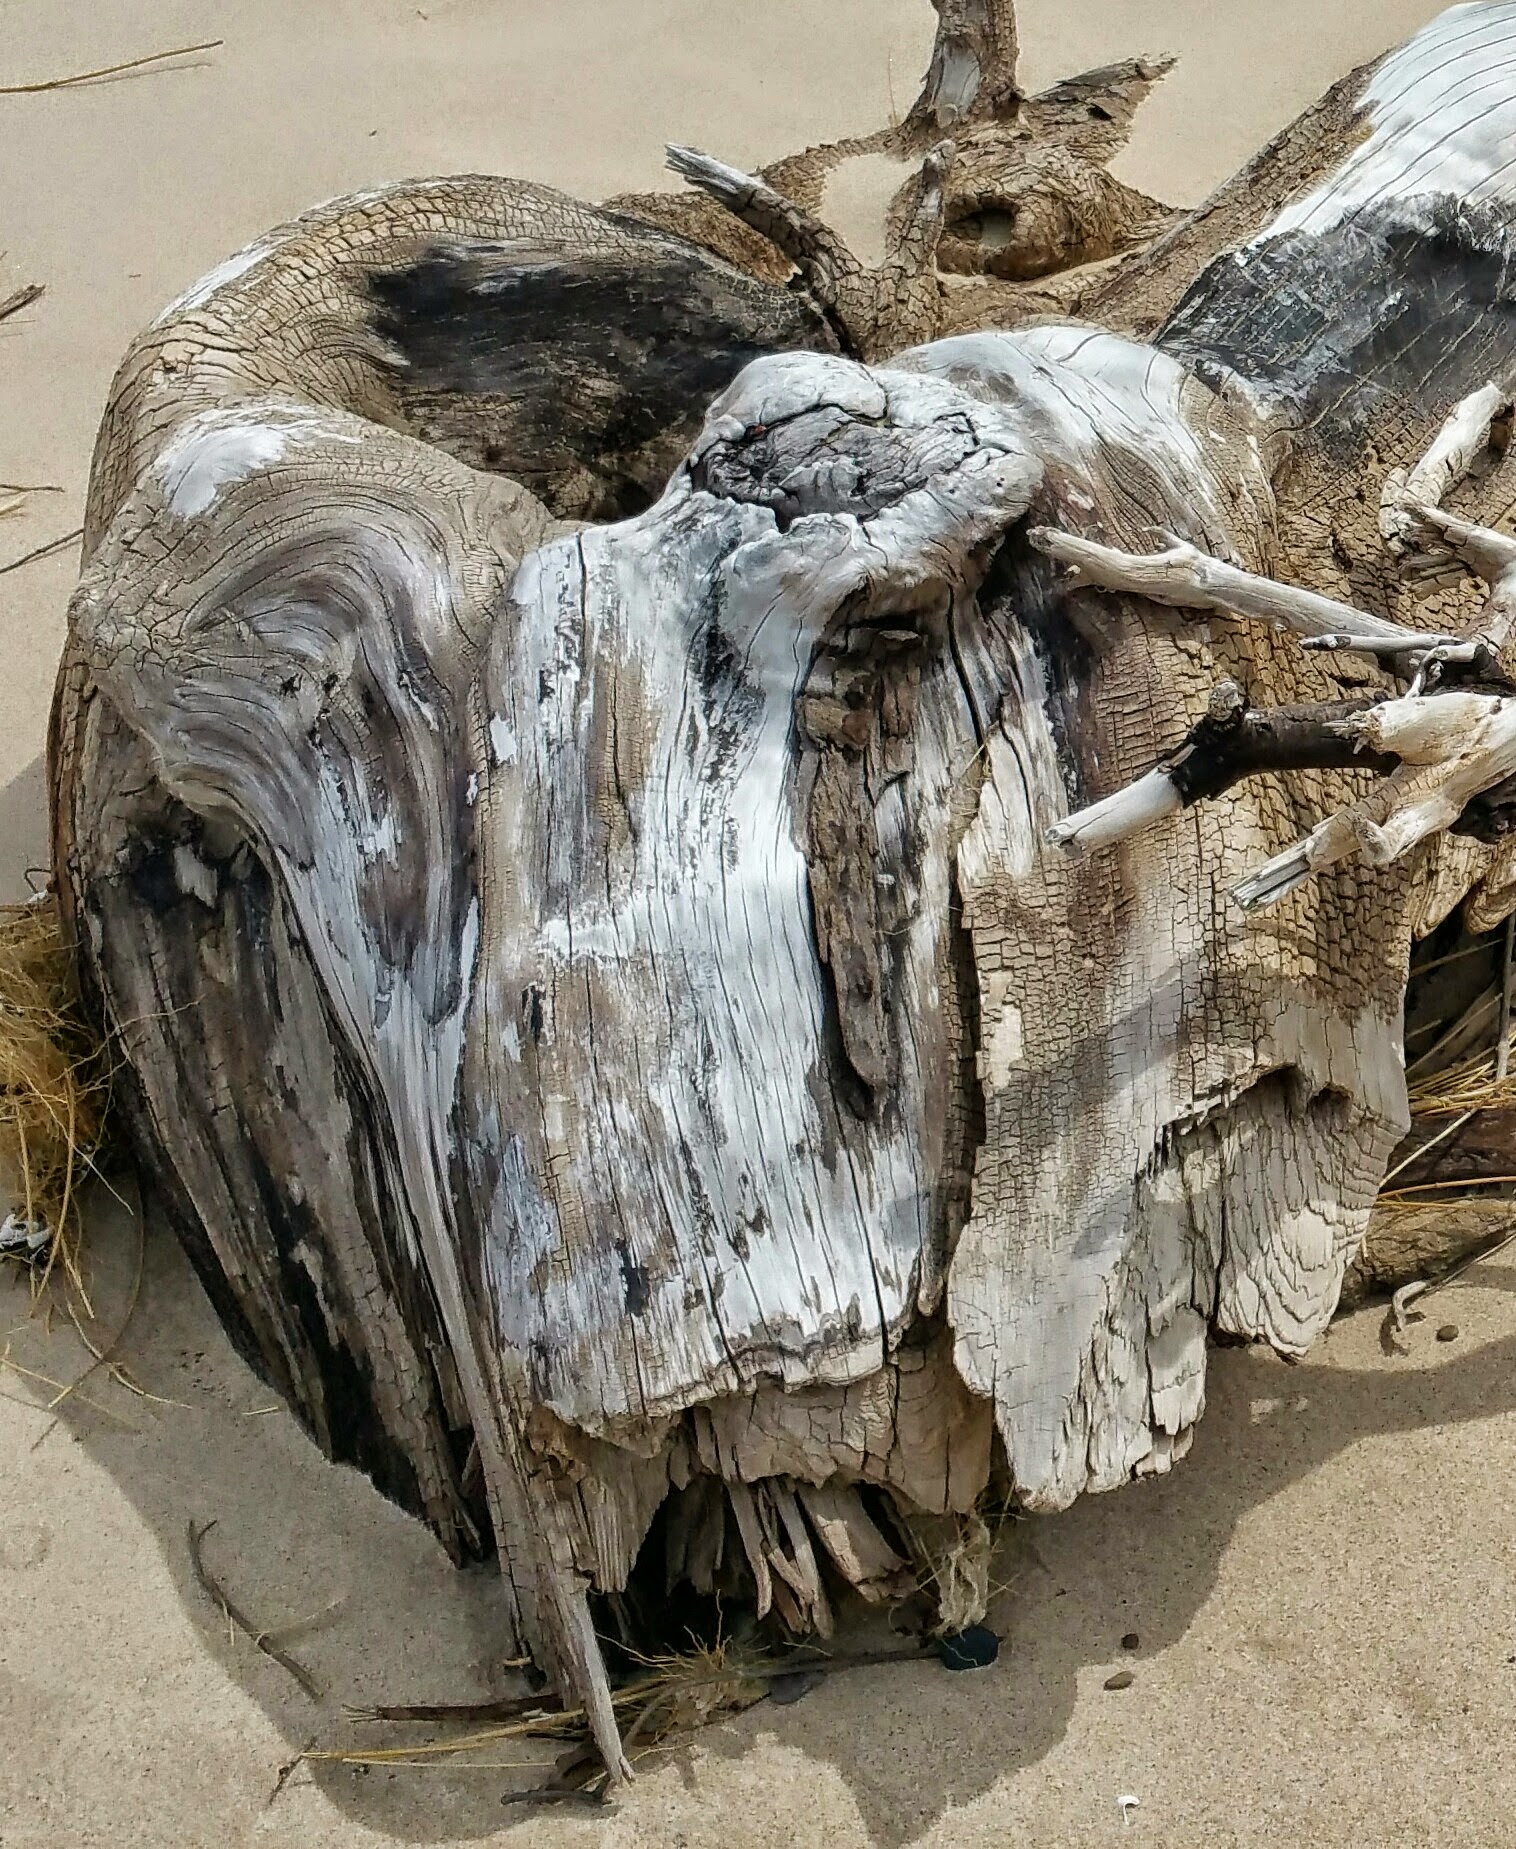 Unidentified Creature Found Along Lake Michigan